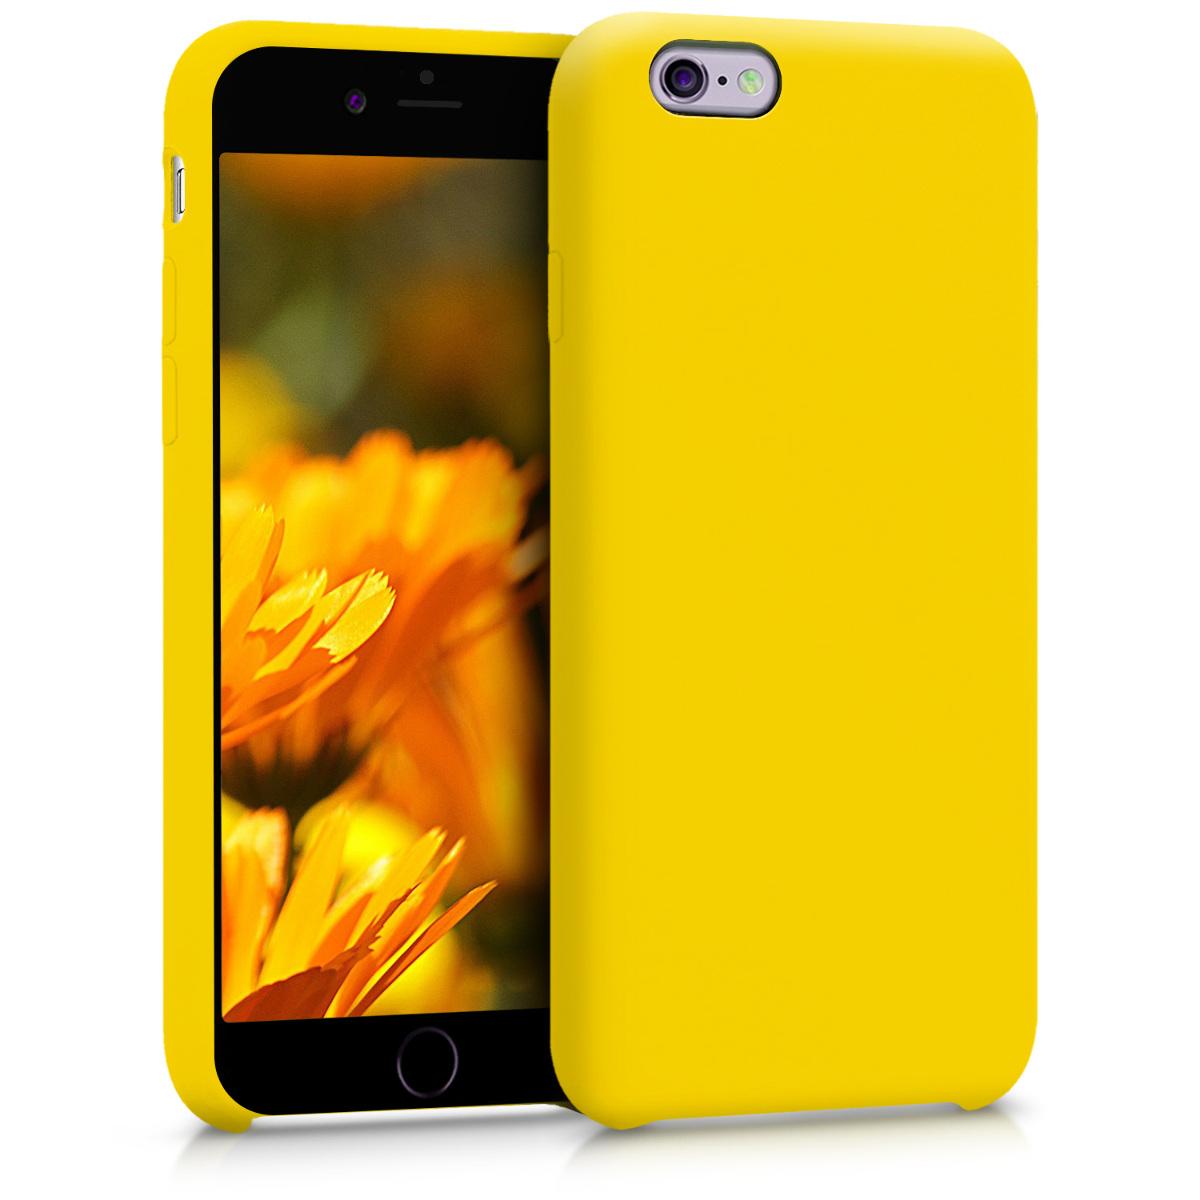 KW Θήκη Σιλικόνης Apple iPhone 6 / 6S - Soft Flexible Rubber - Vibrant Yellow (40223.165)